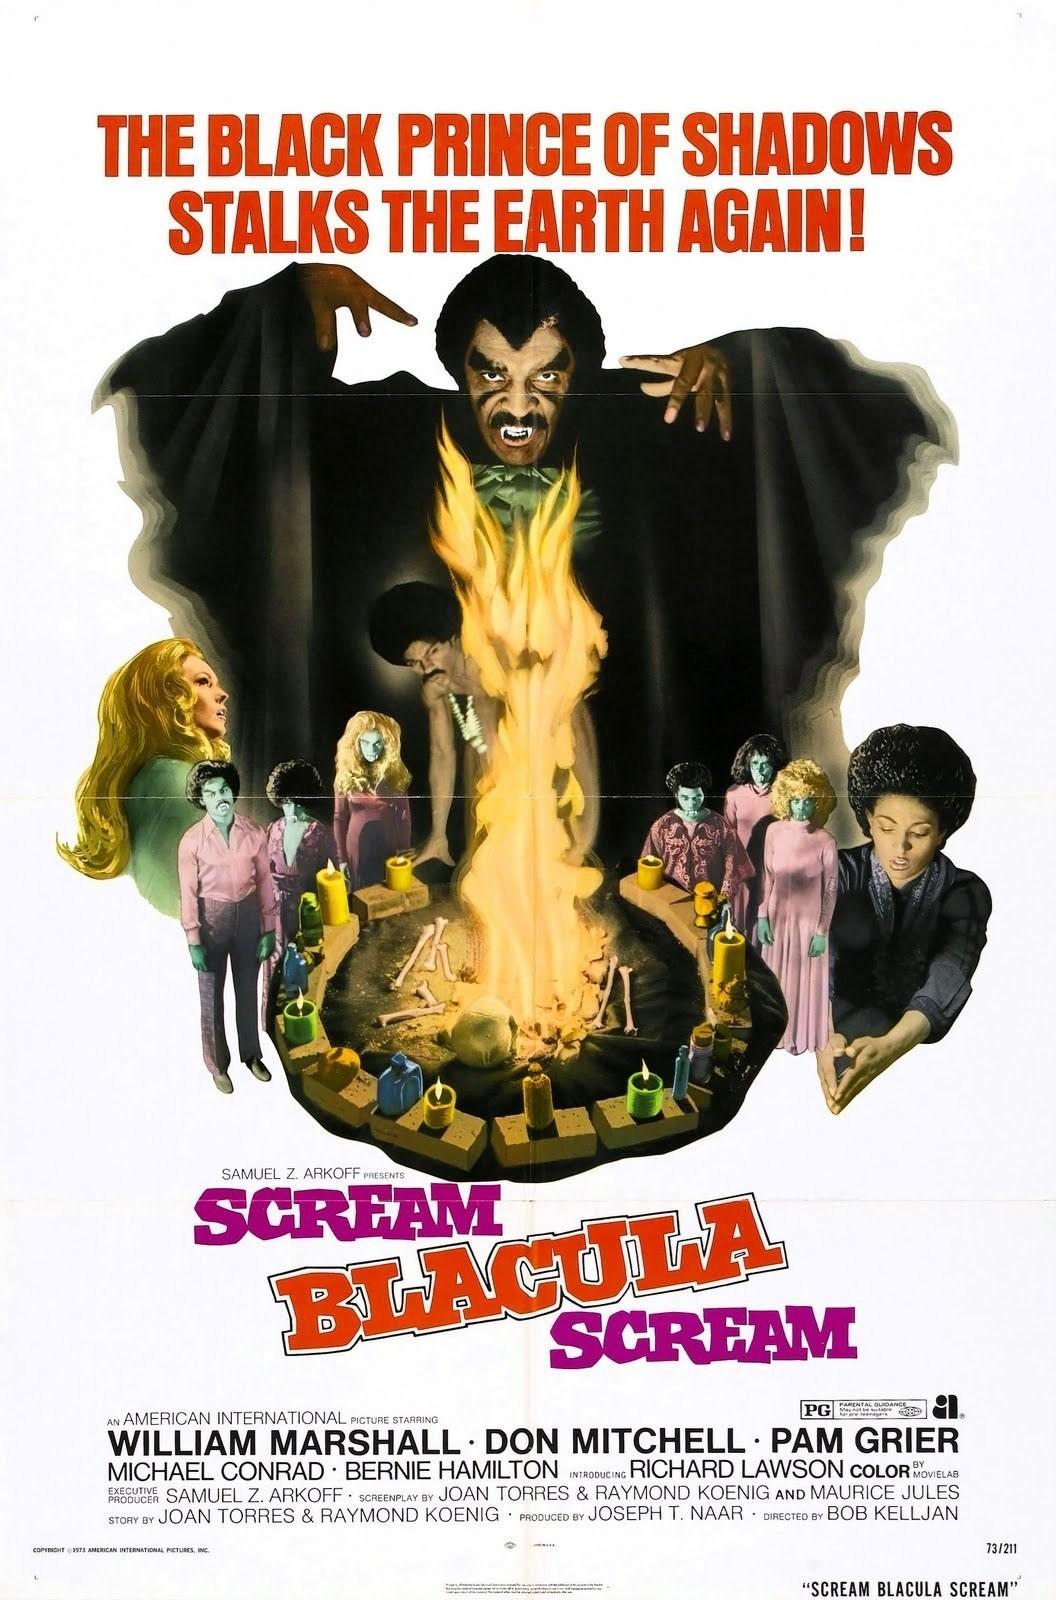 'Scream Blacula Scream' $9.99